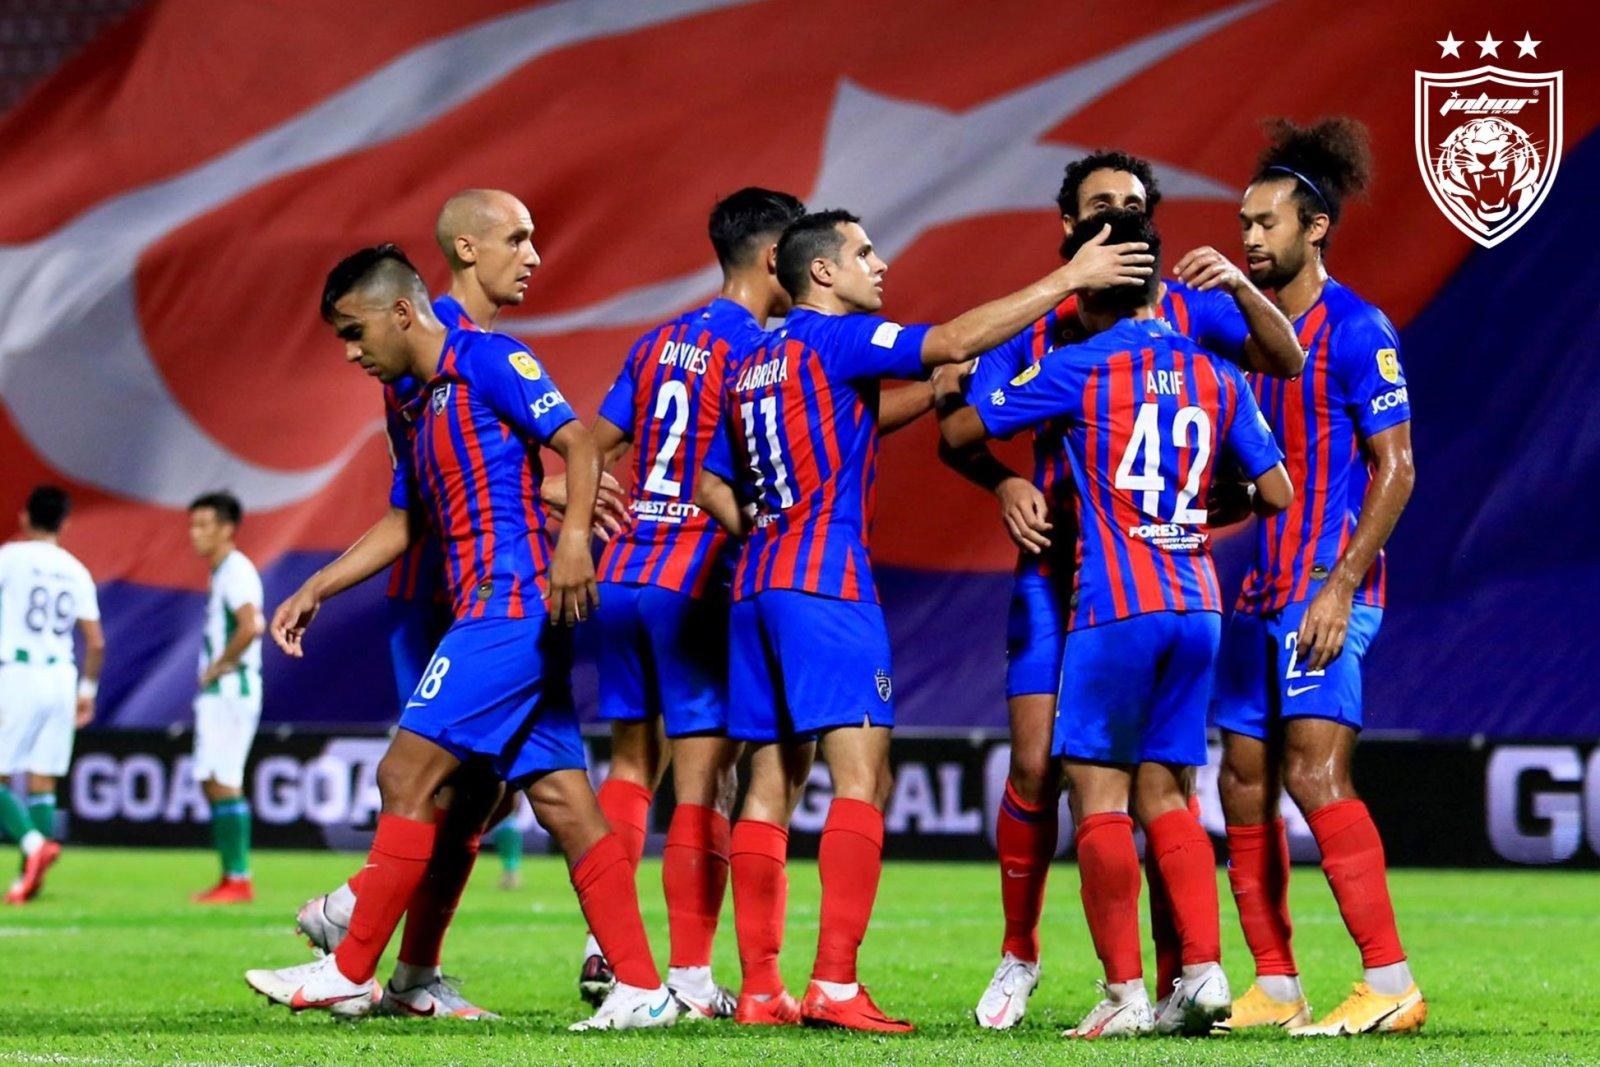 JDT Kuching FA Piala Malaysia 2020 Tiada Tuah